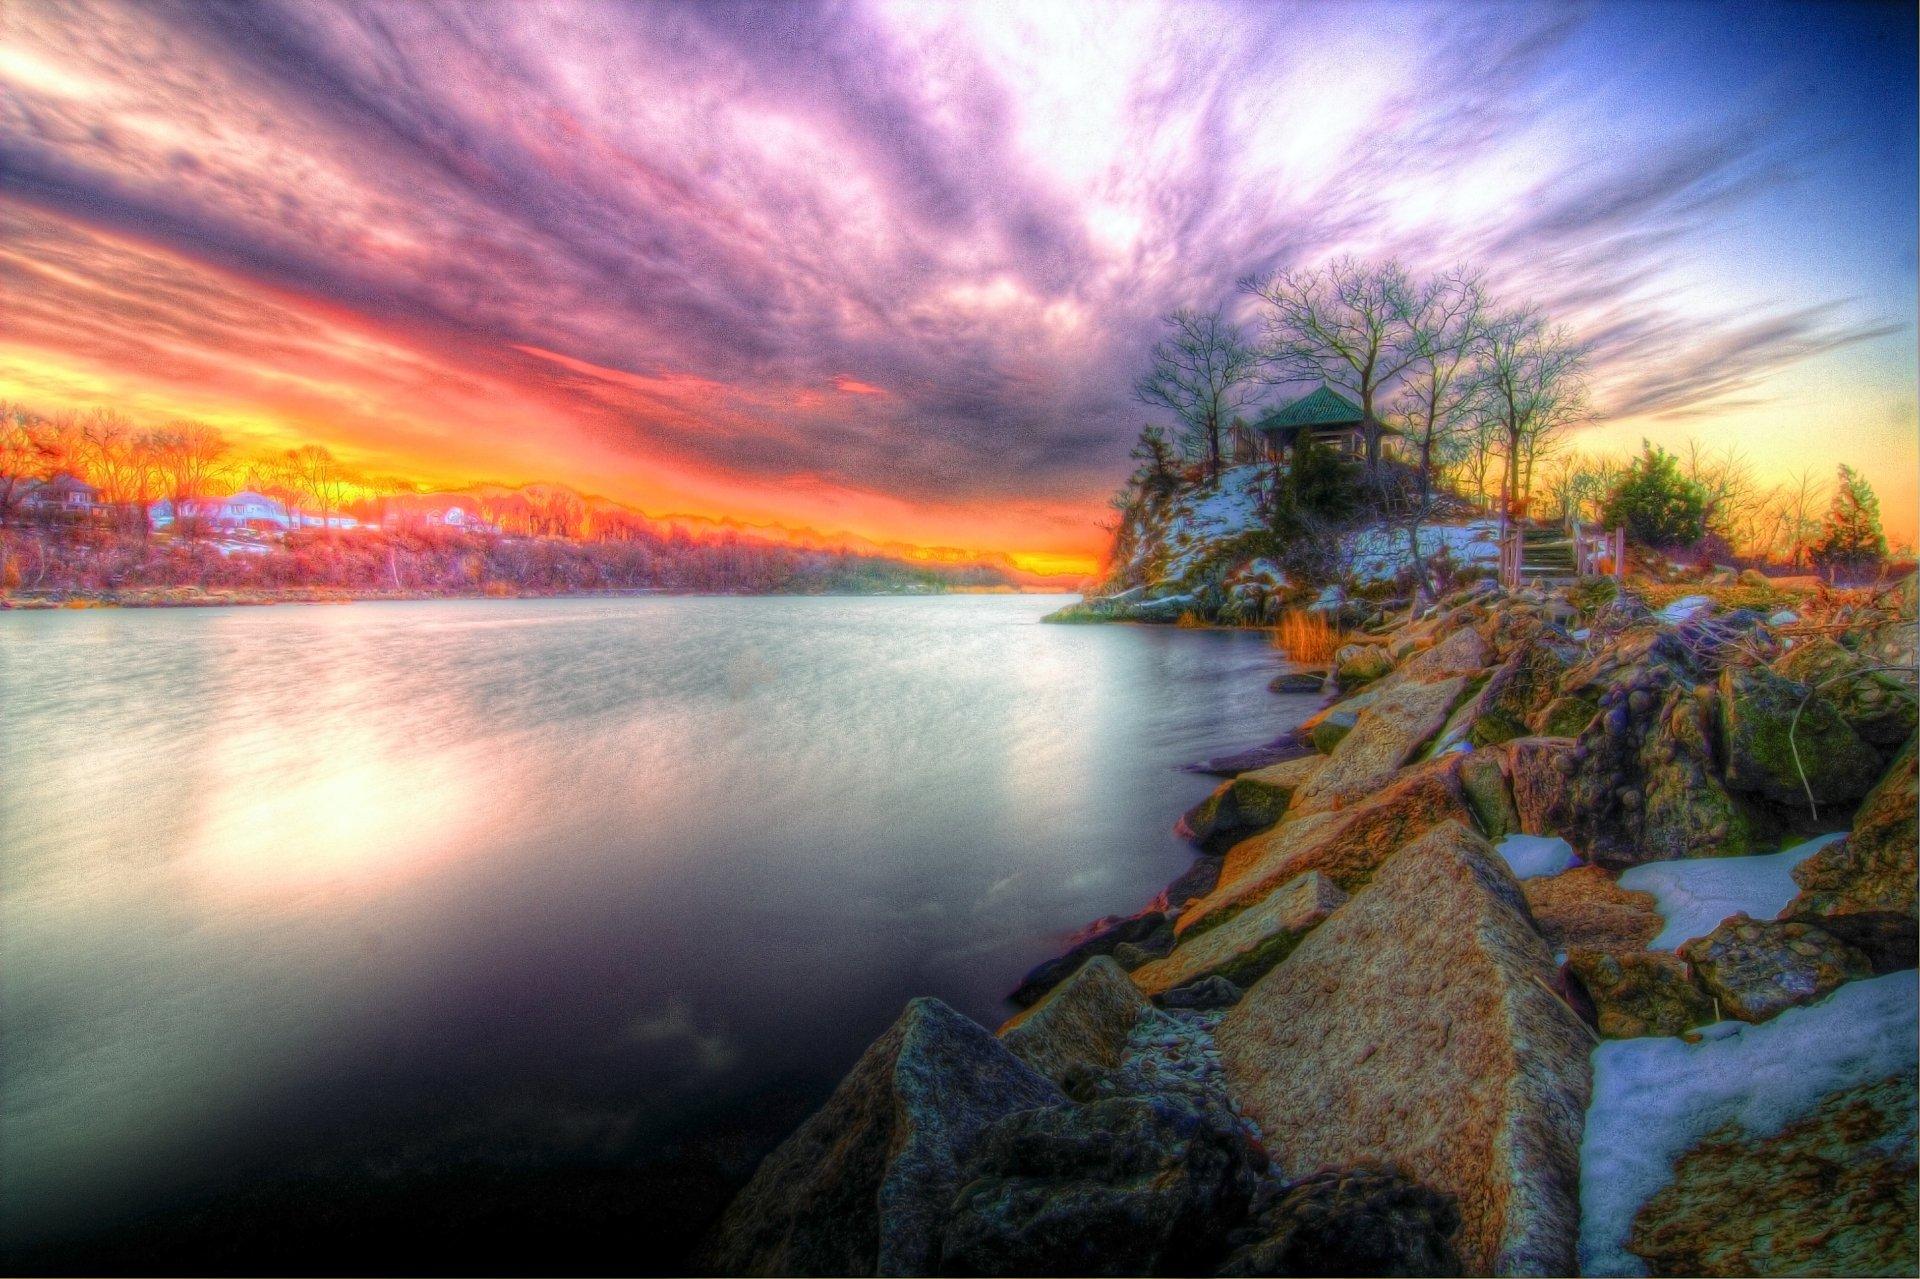 Sunset 4k Ultra HD Wallpaper   Background Image ...